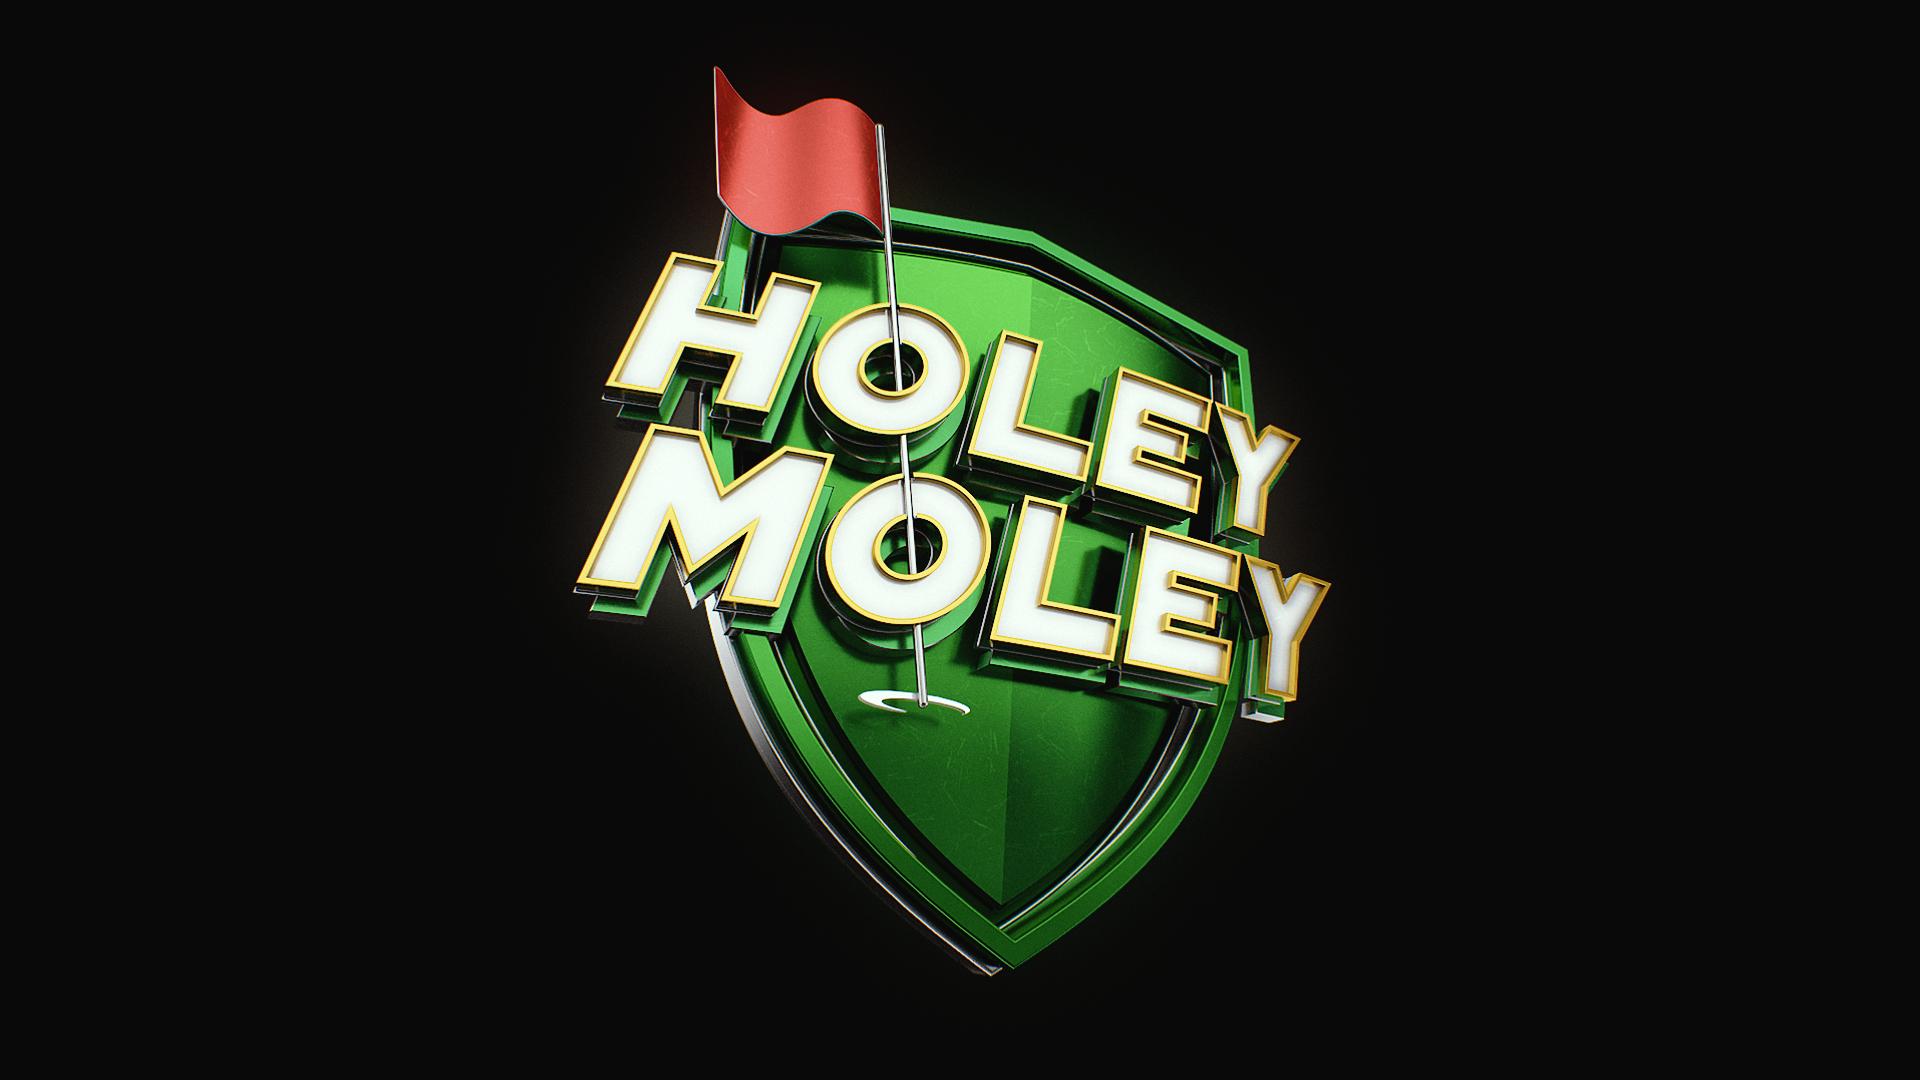 HOLEY_MOLEY_Logo_06_ALT.png